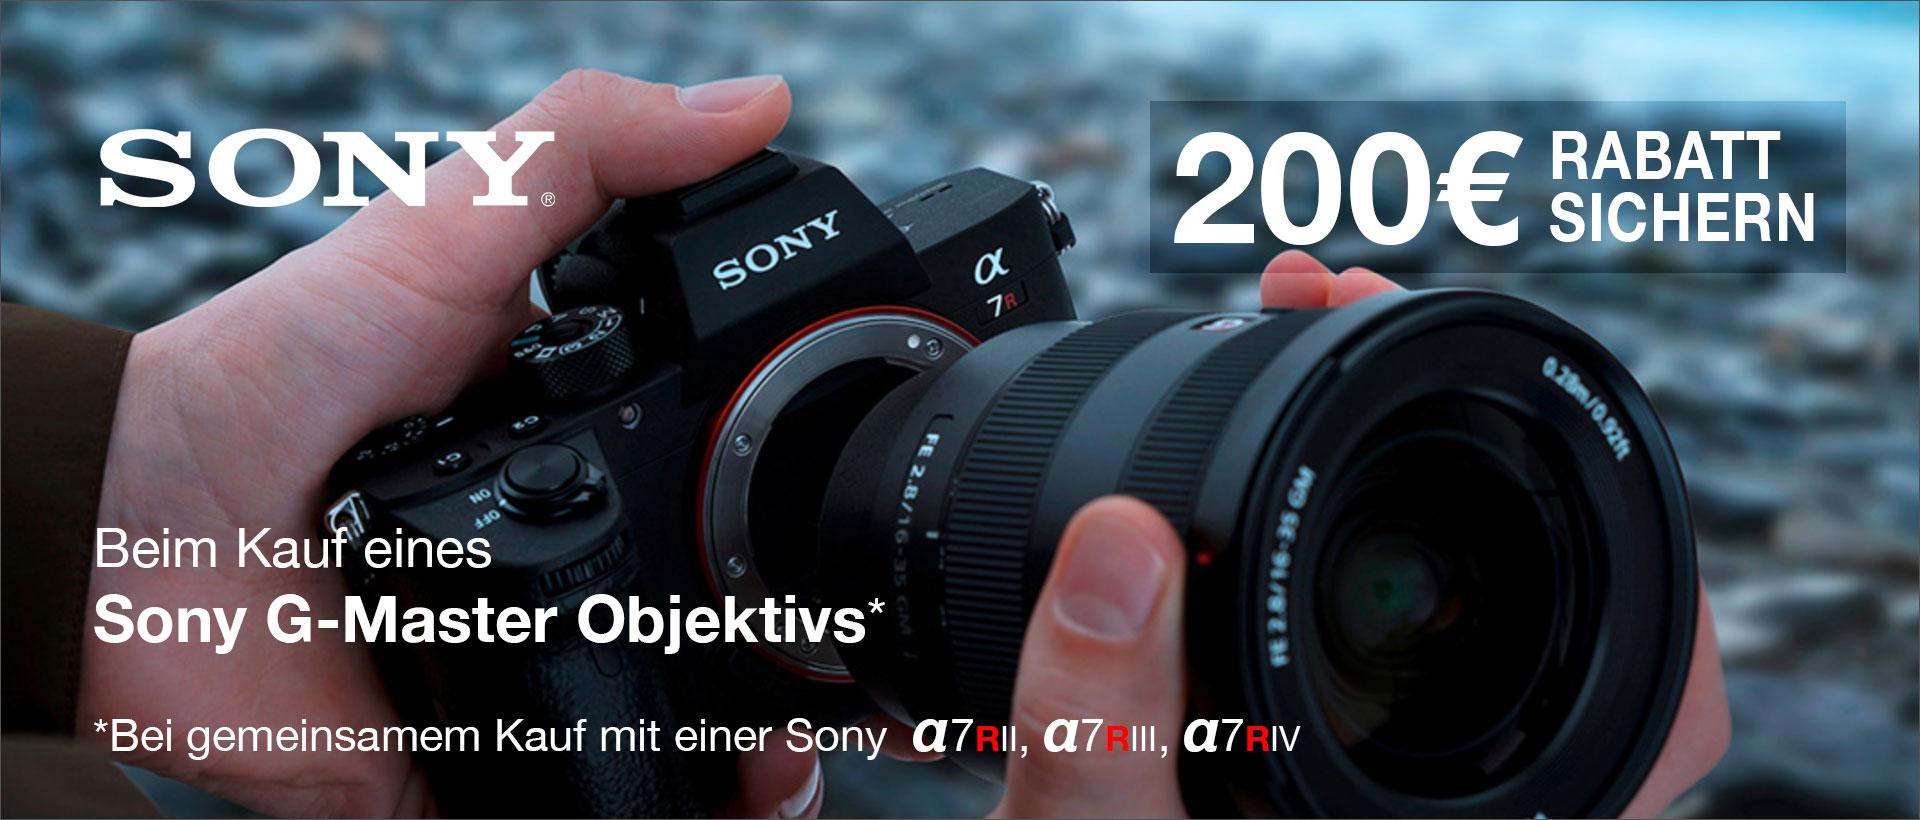 Sony 200 Euro Rabatt Aktion